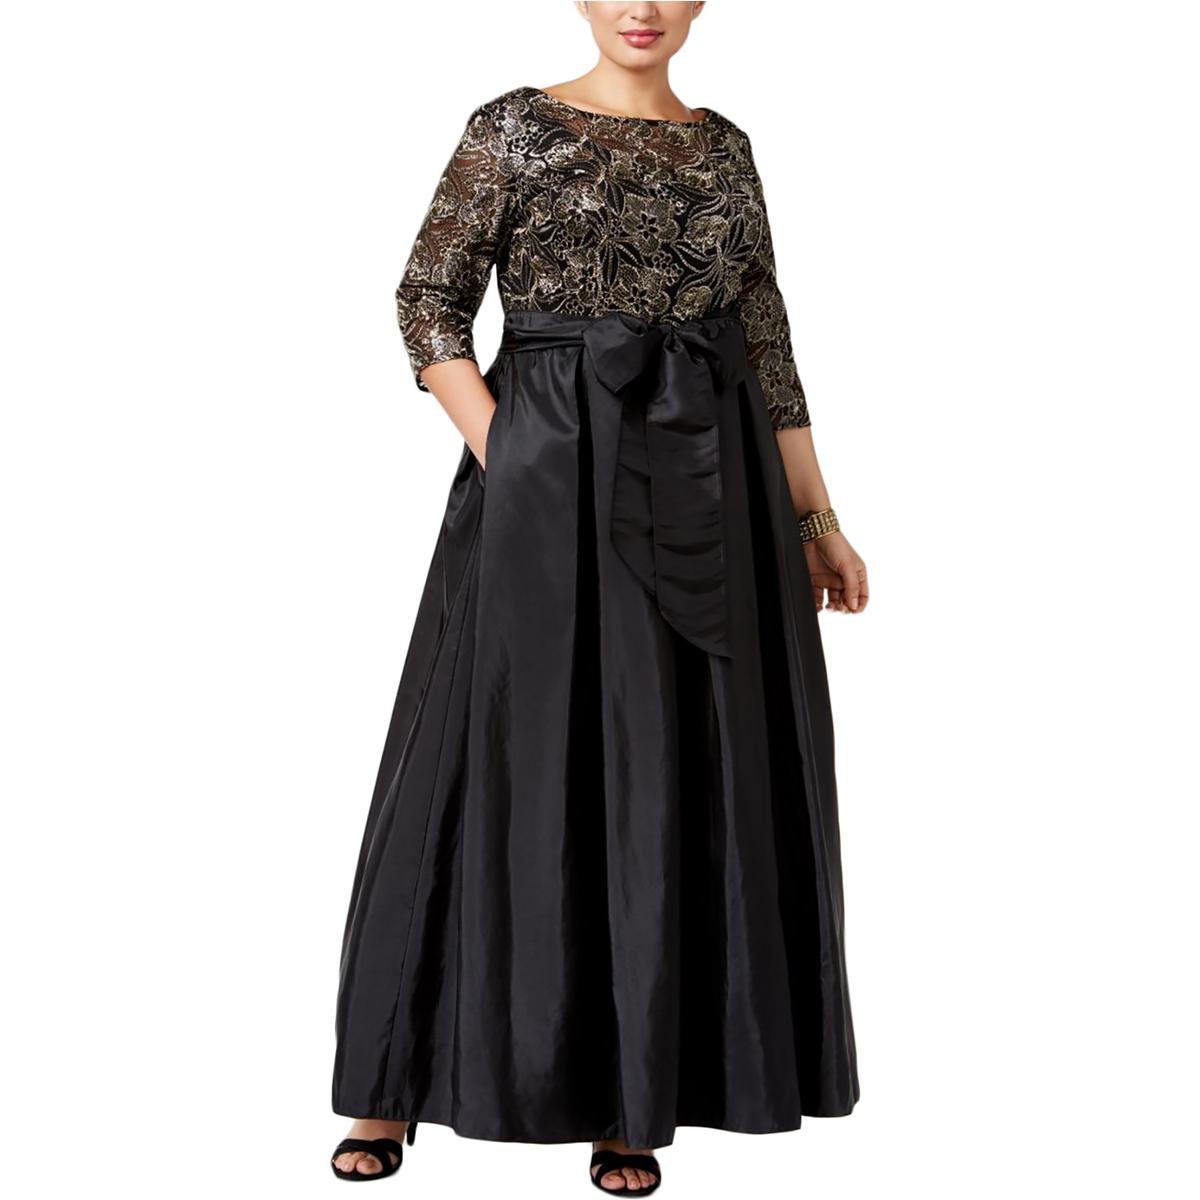 Alex Evenings Women's Plus Size Line Ballgown Evening Dress, Black/Gold, 16W